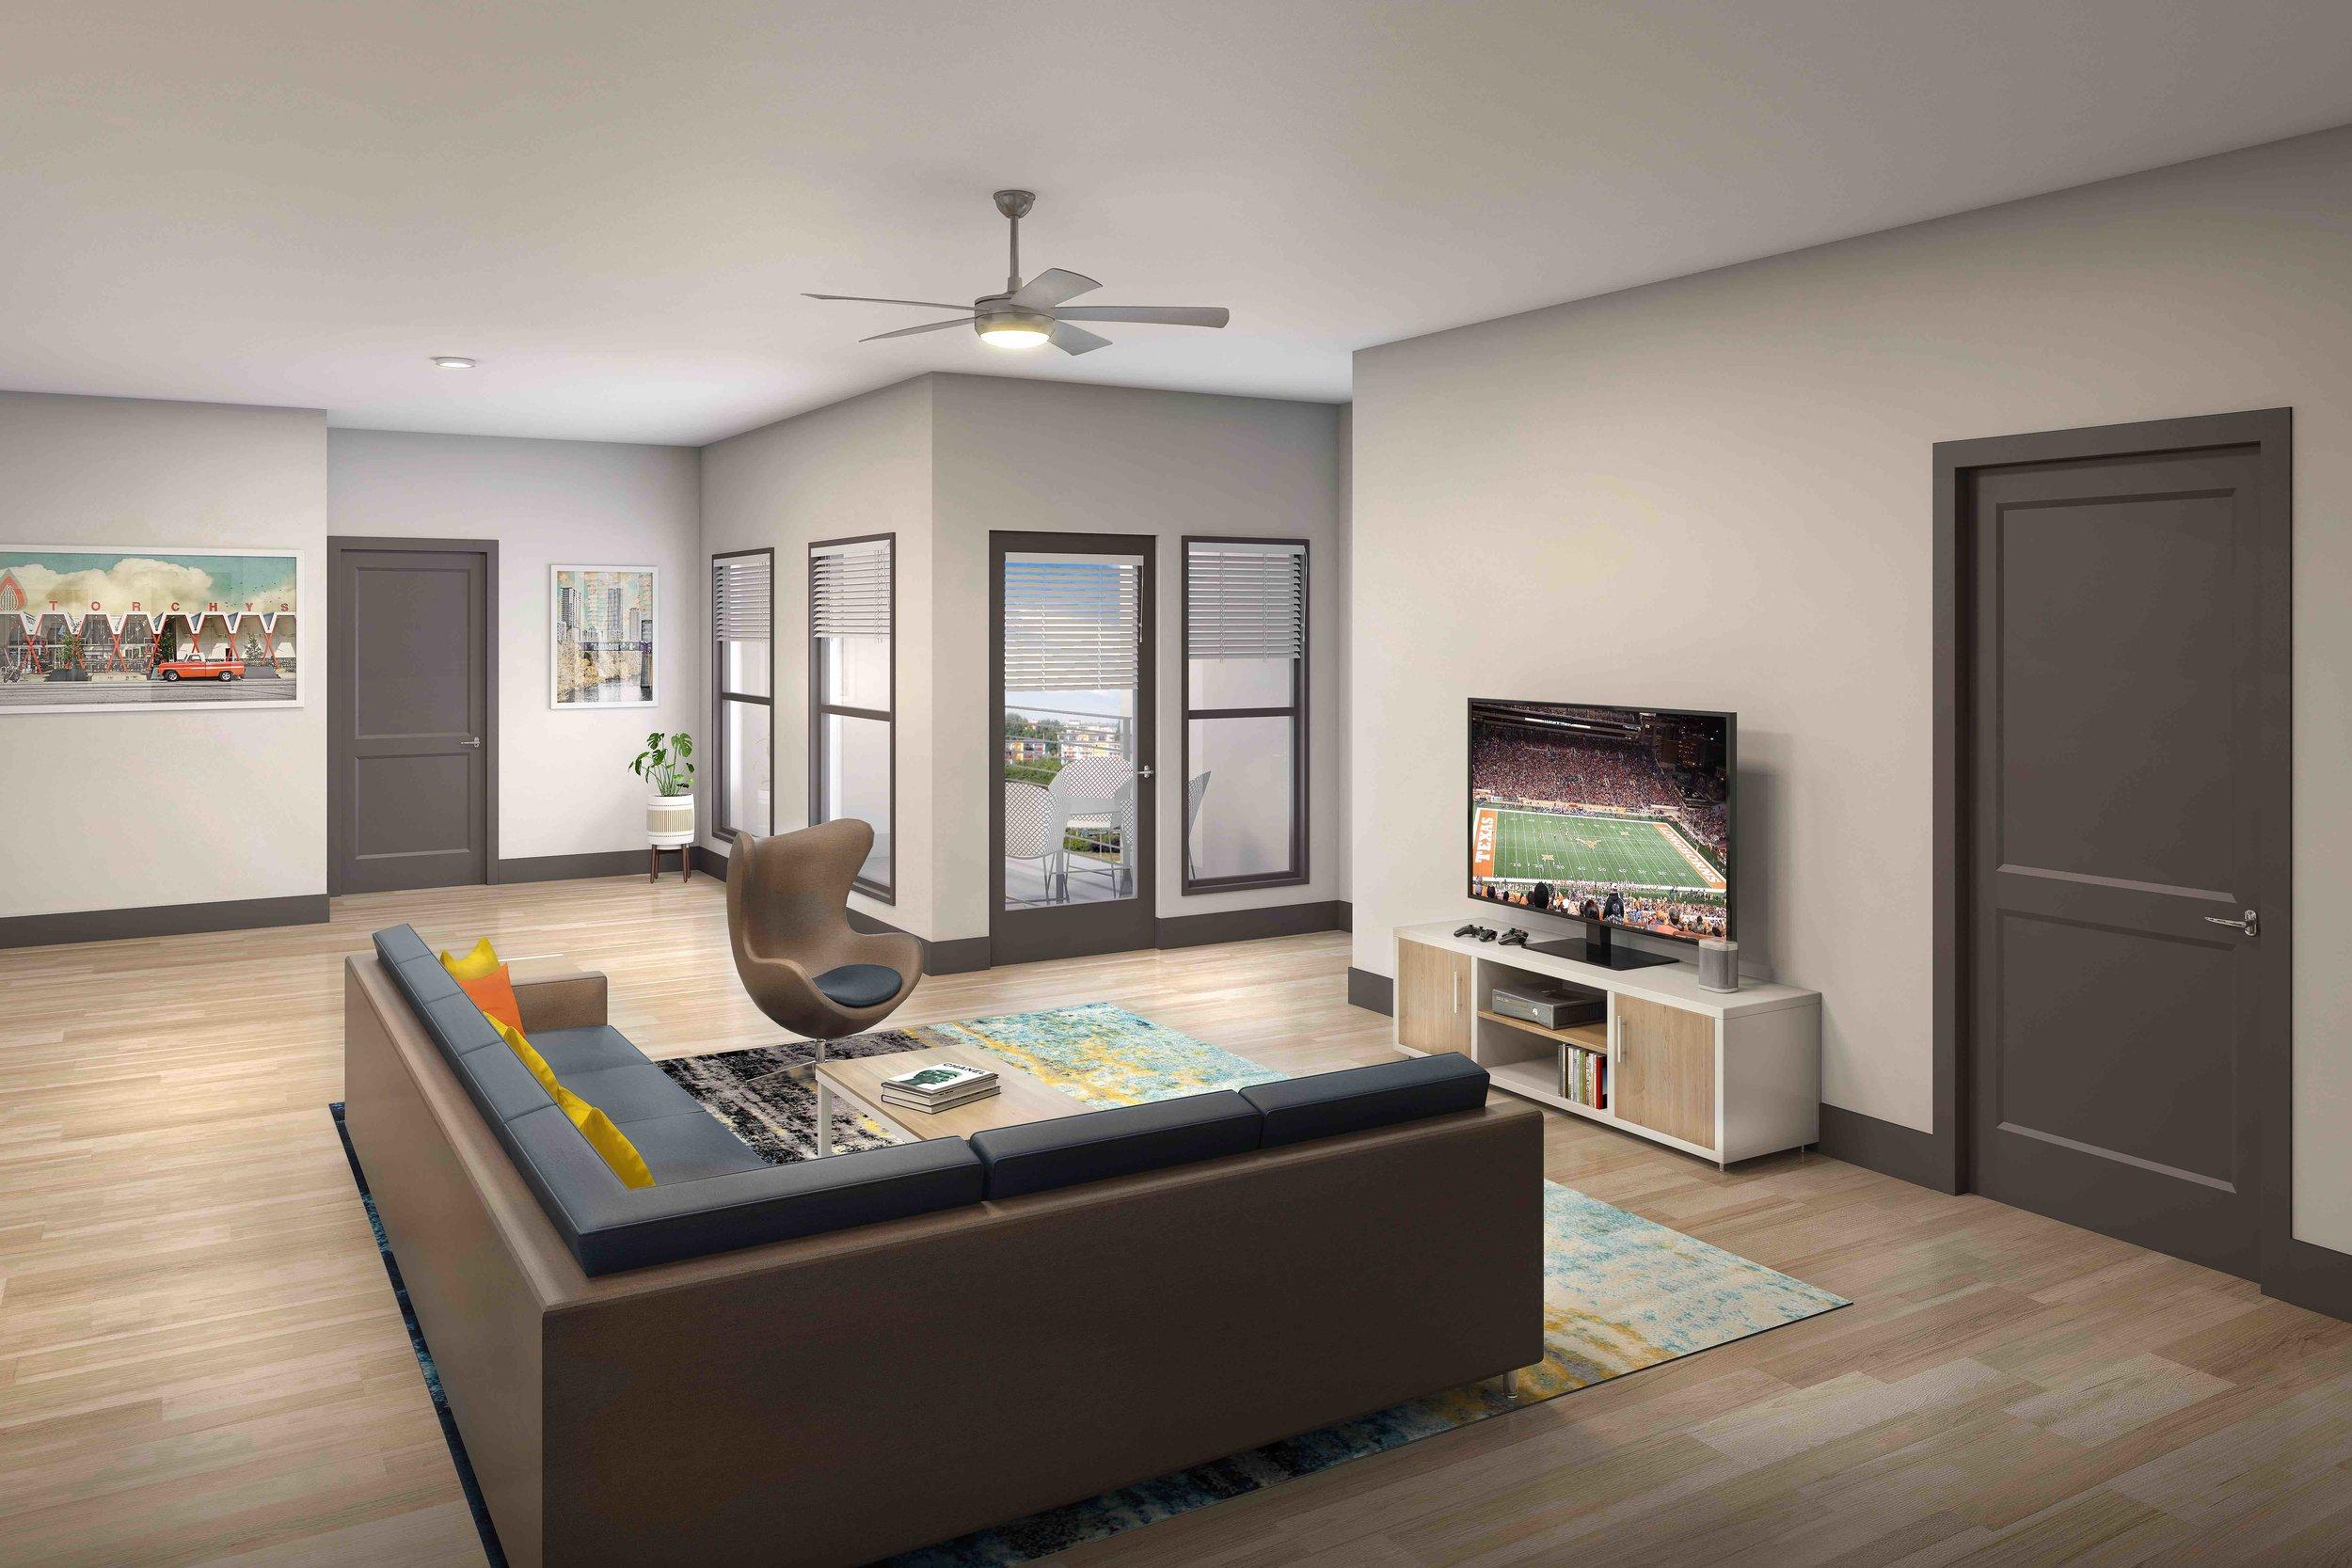 7 - Living Room copy.jpg